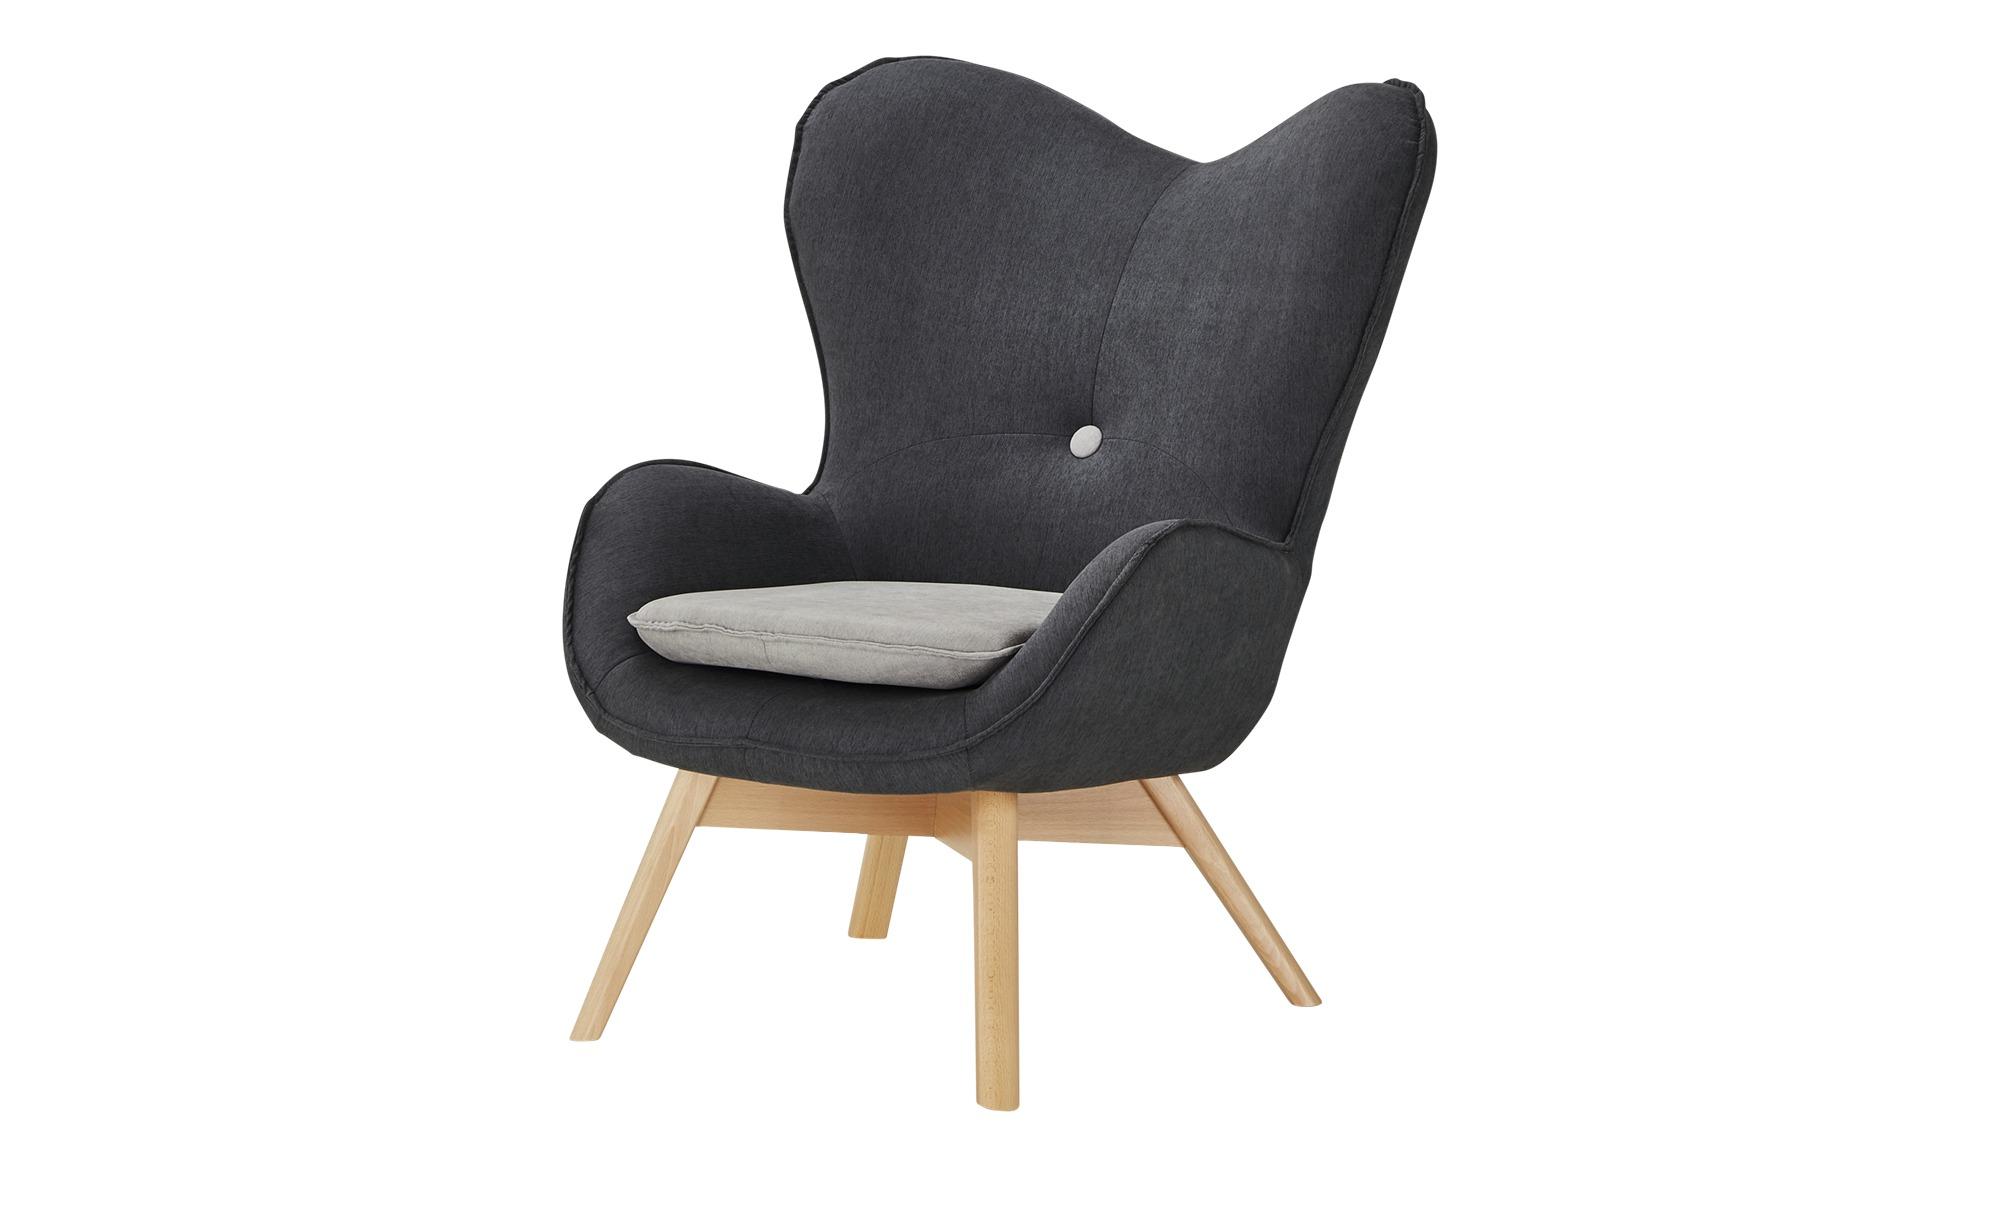 Sessel  Maxi ¦ grau ¦ Maße (cm): B: 86 H: 100 T: 92 Polstermöbel > Sessel > Ohrensessel - Höffner